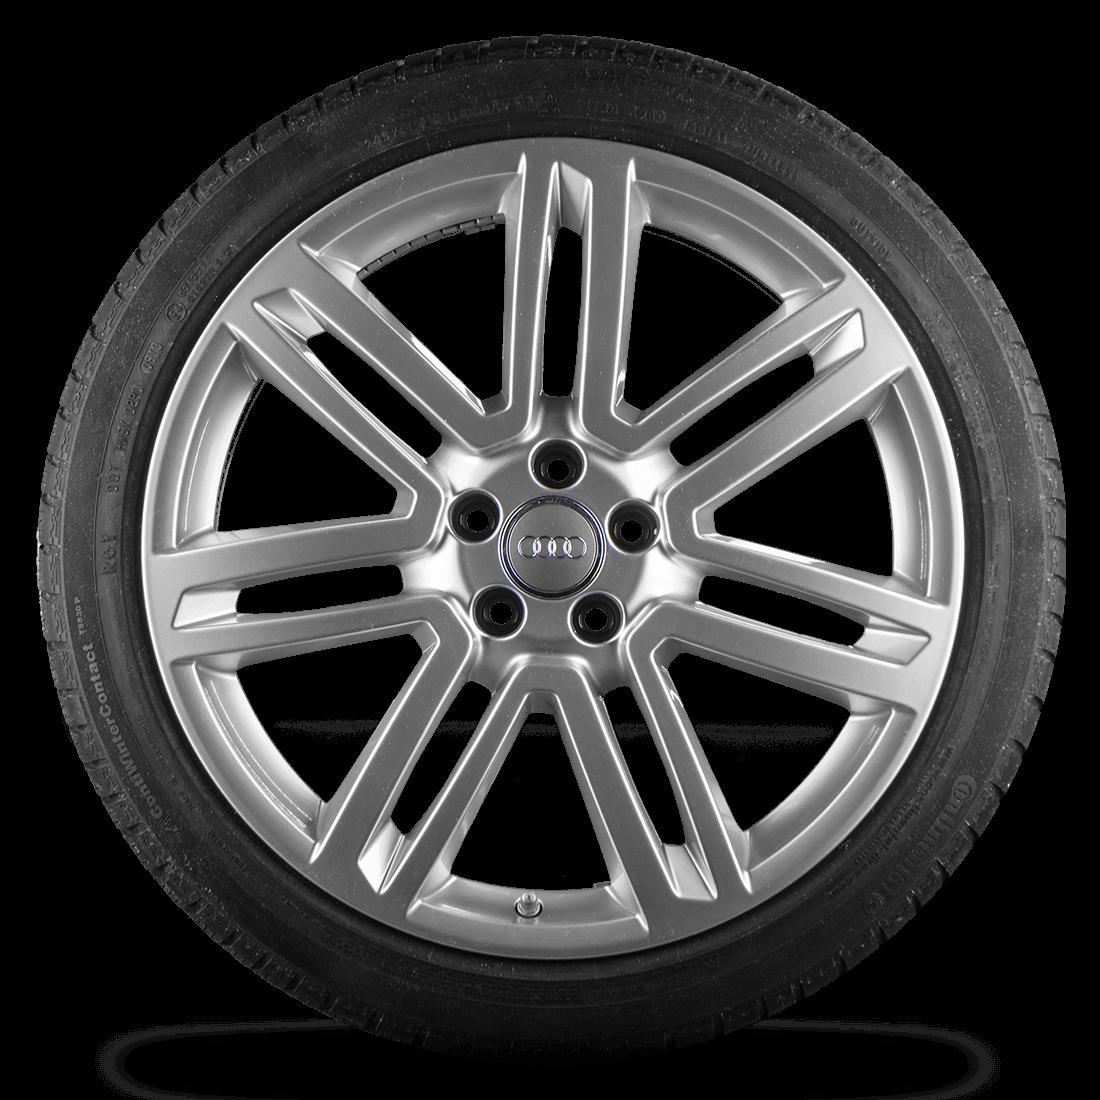 Audi RS6 4G 20 Zoll Winterräder S line Winterreifen Alufelgen Felgen 4G0601025AS